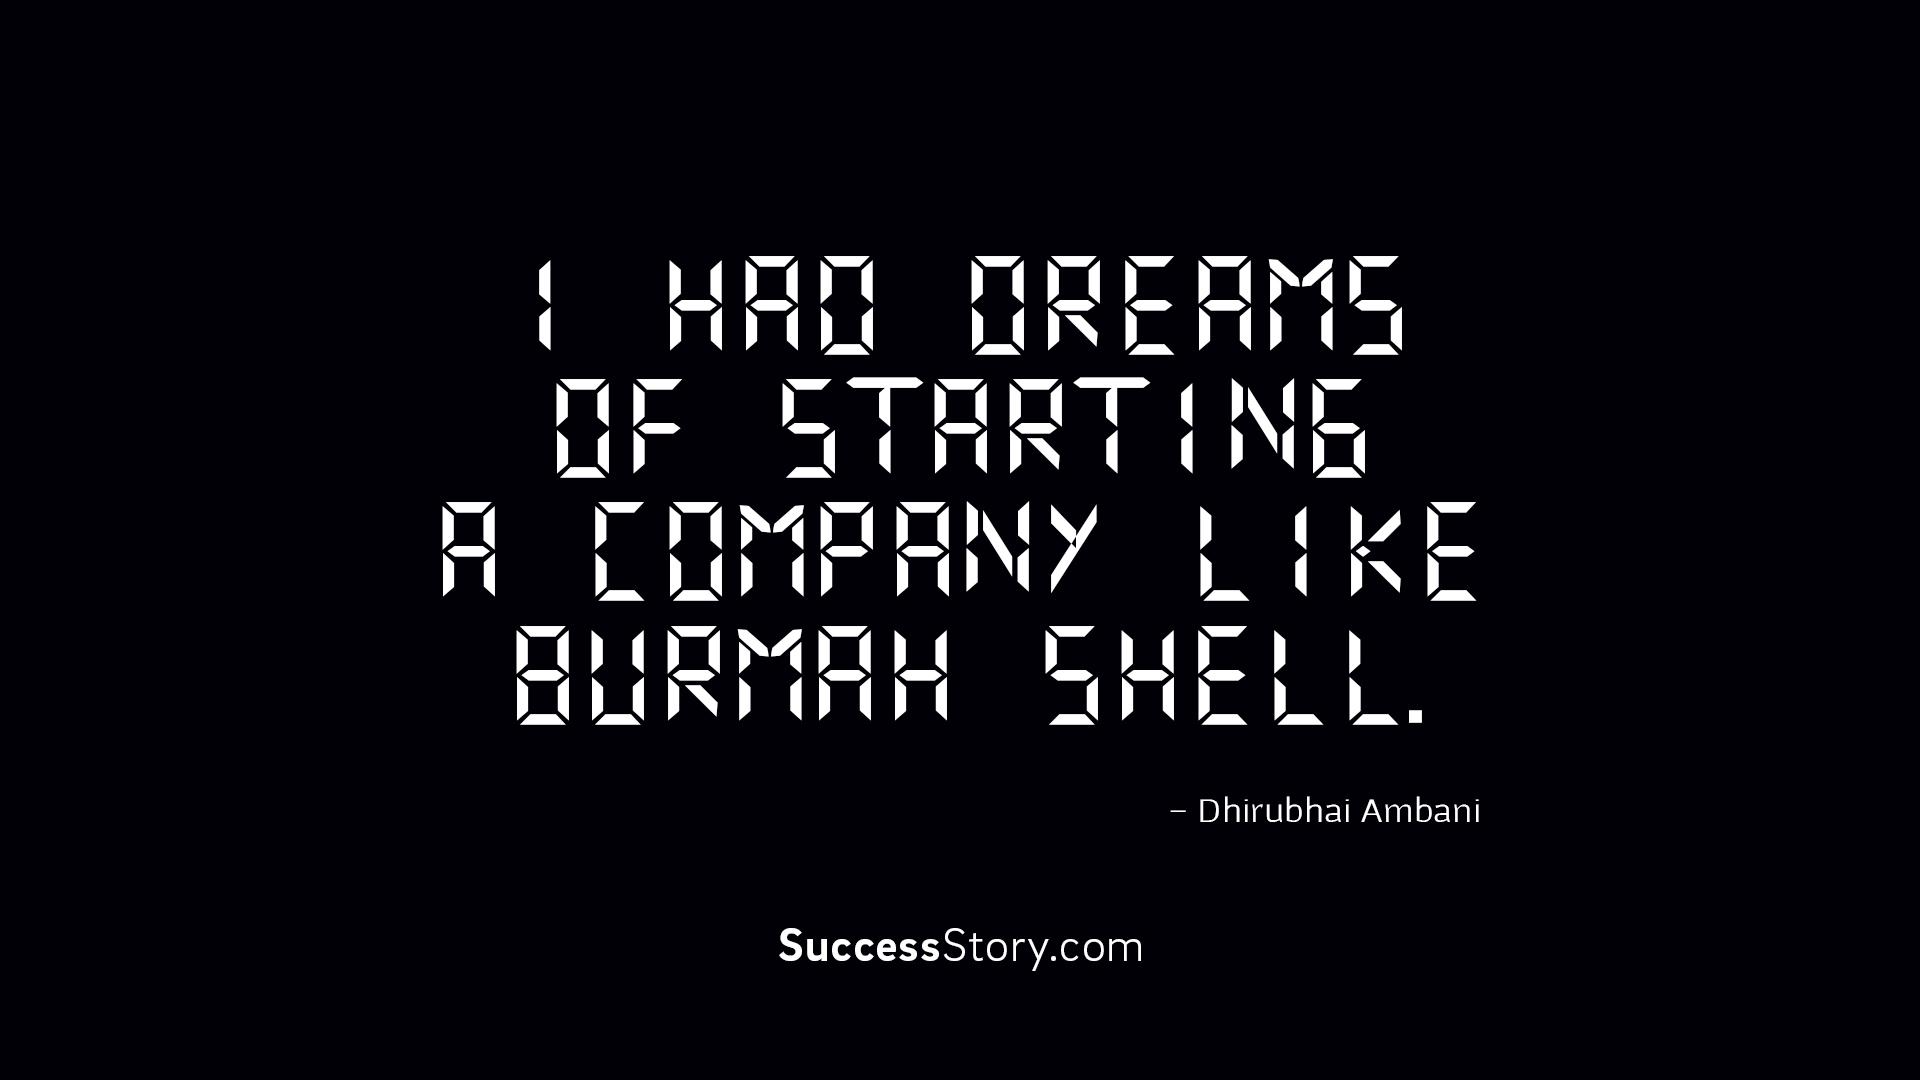 I had dreams of starting a compa